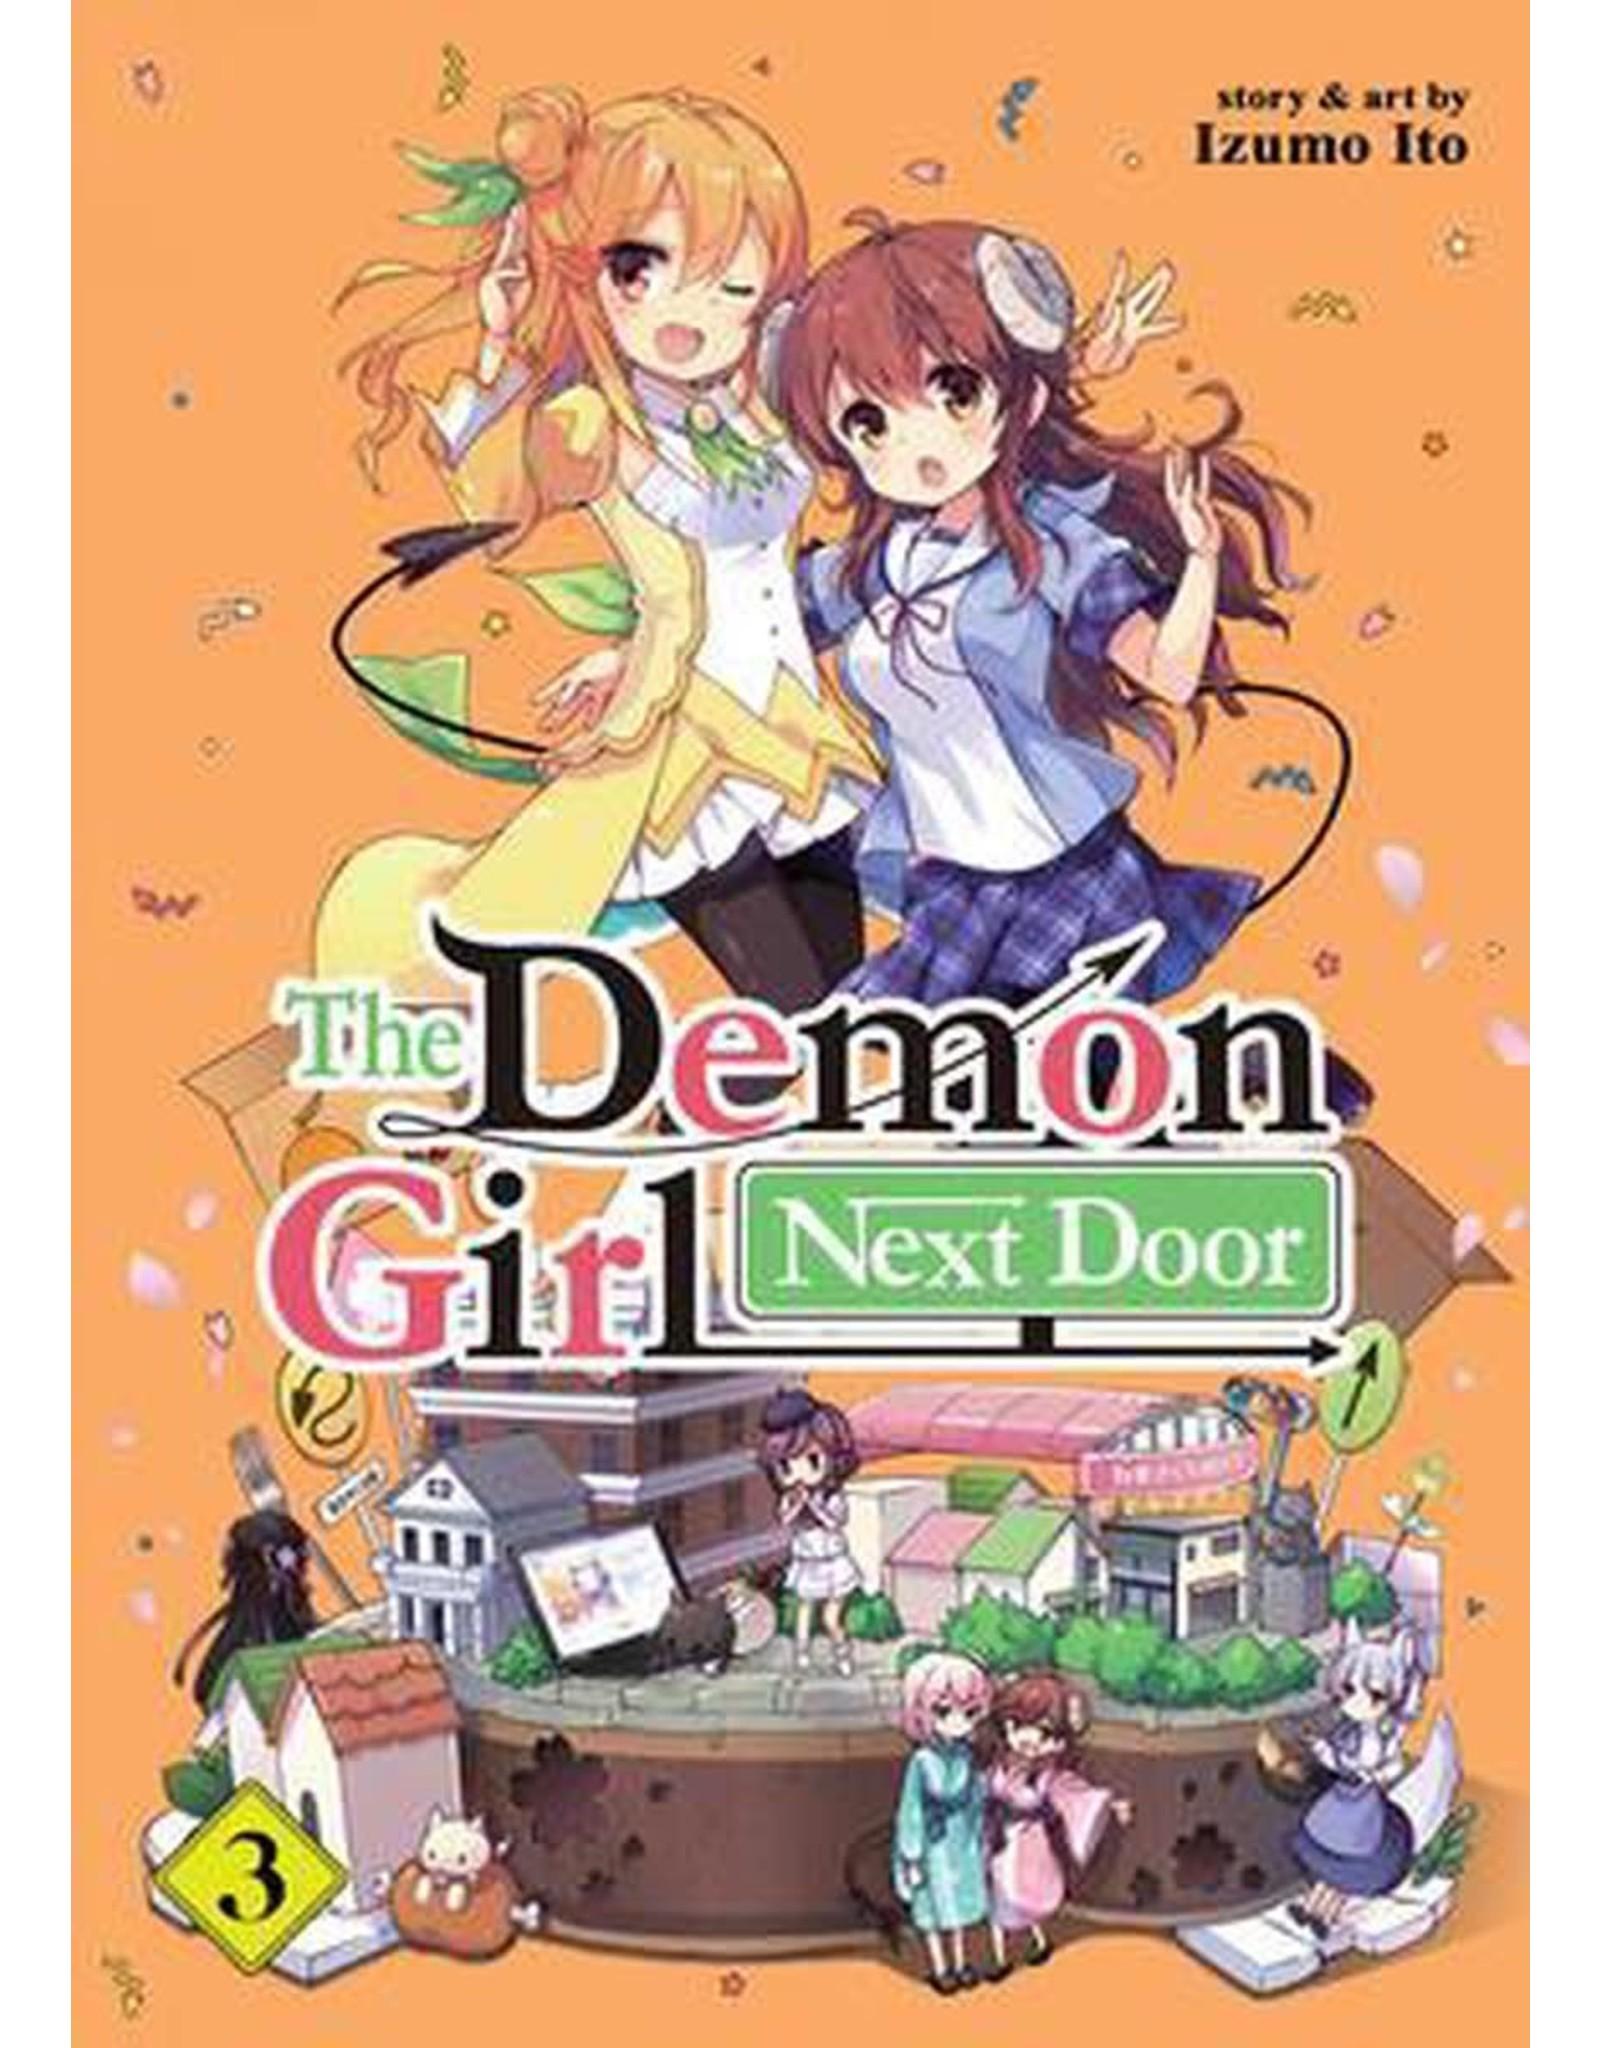 The Demon Girl Next Door 3 (Engelstalig) - Manga